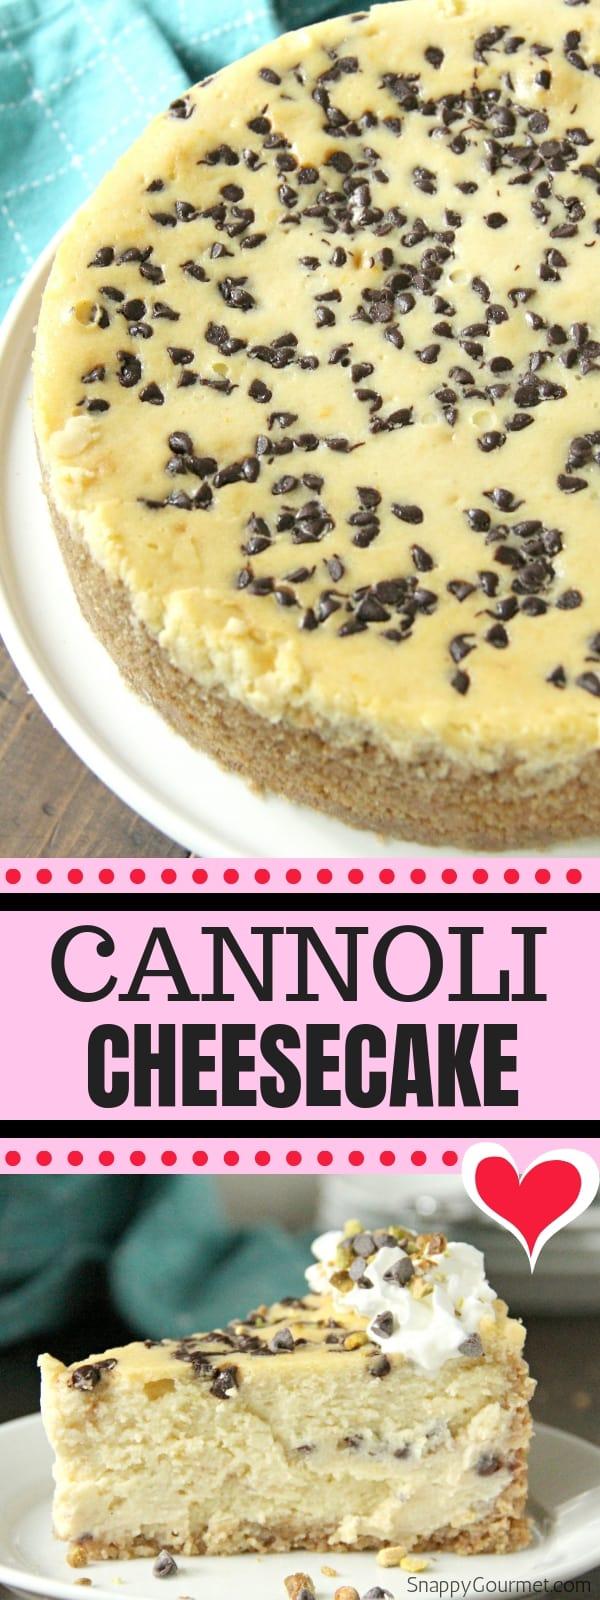 cannoli cheesecake collage